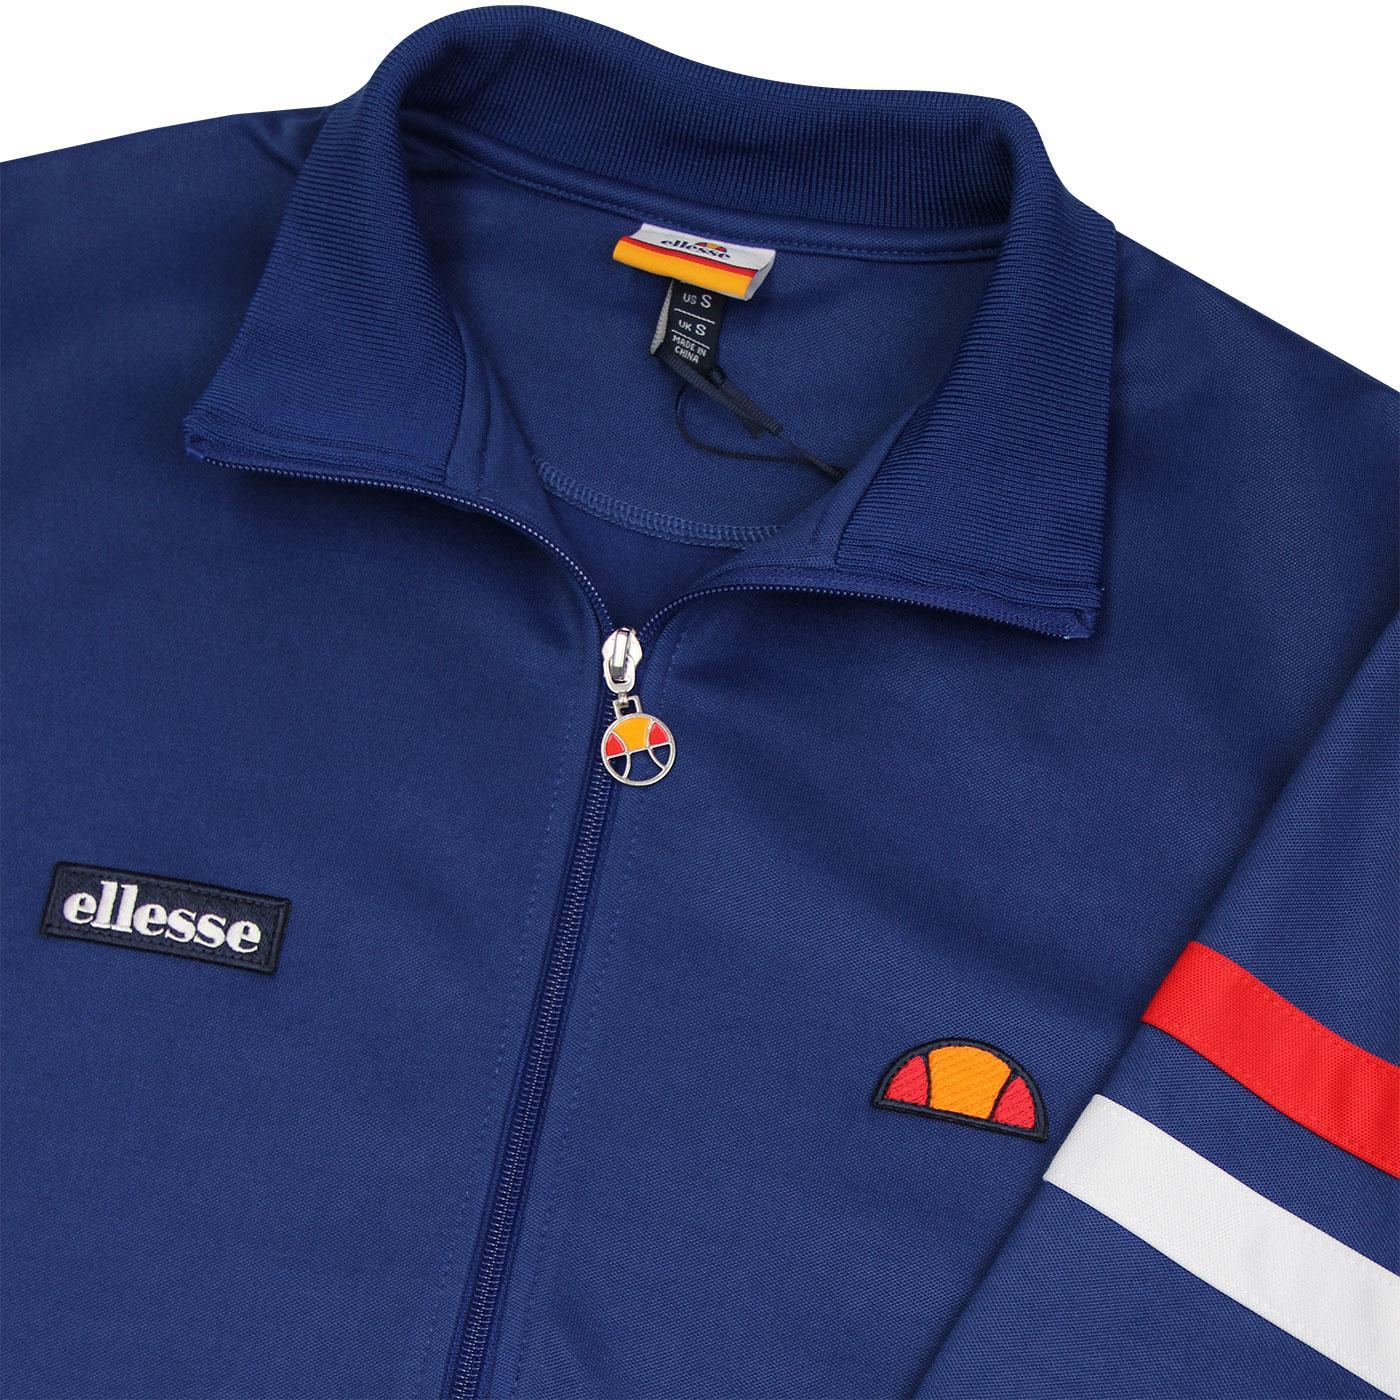 Milan Roma Ellesse Rimini Track Top in Navy /& Red tracksuit jacket